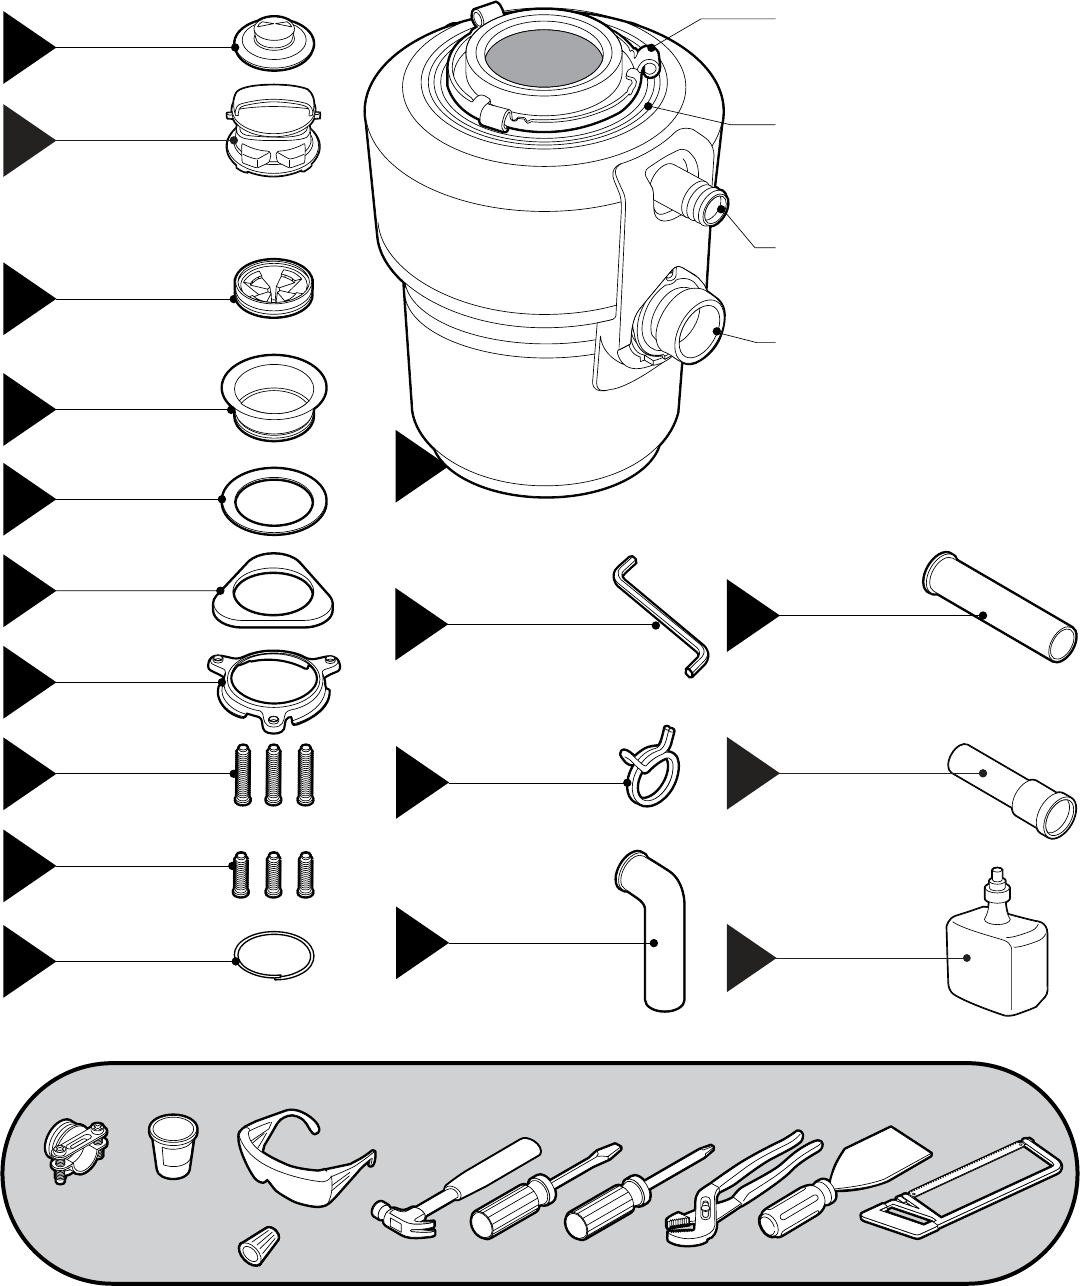 InSinkErator   Evolution Series™ Garbage Disposal Installation Manual